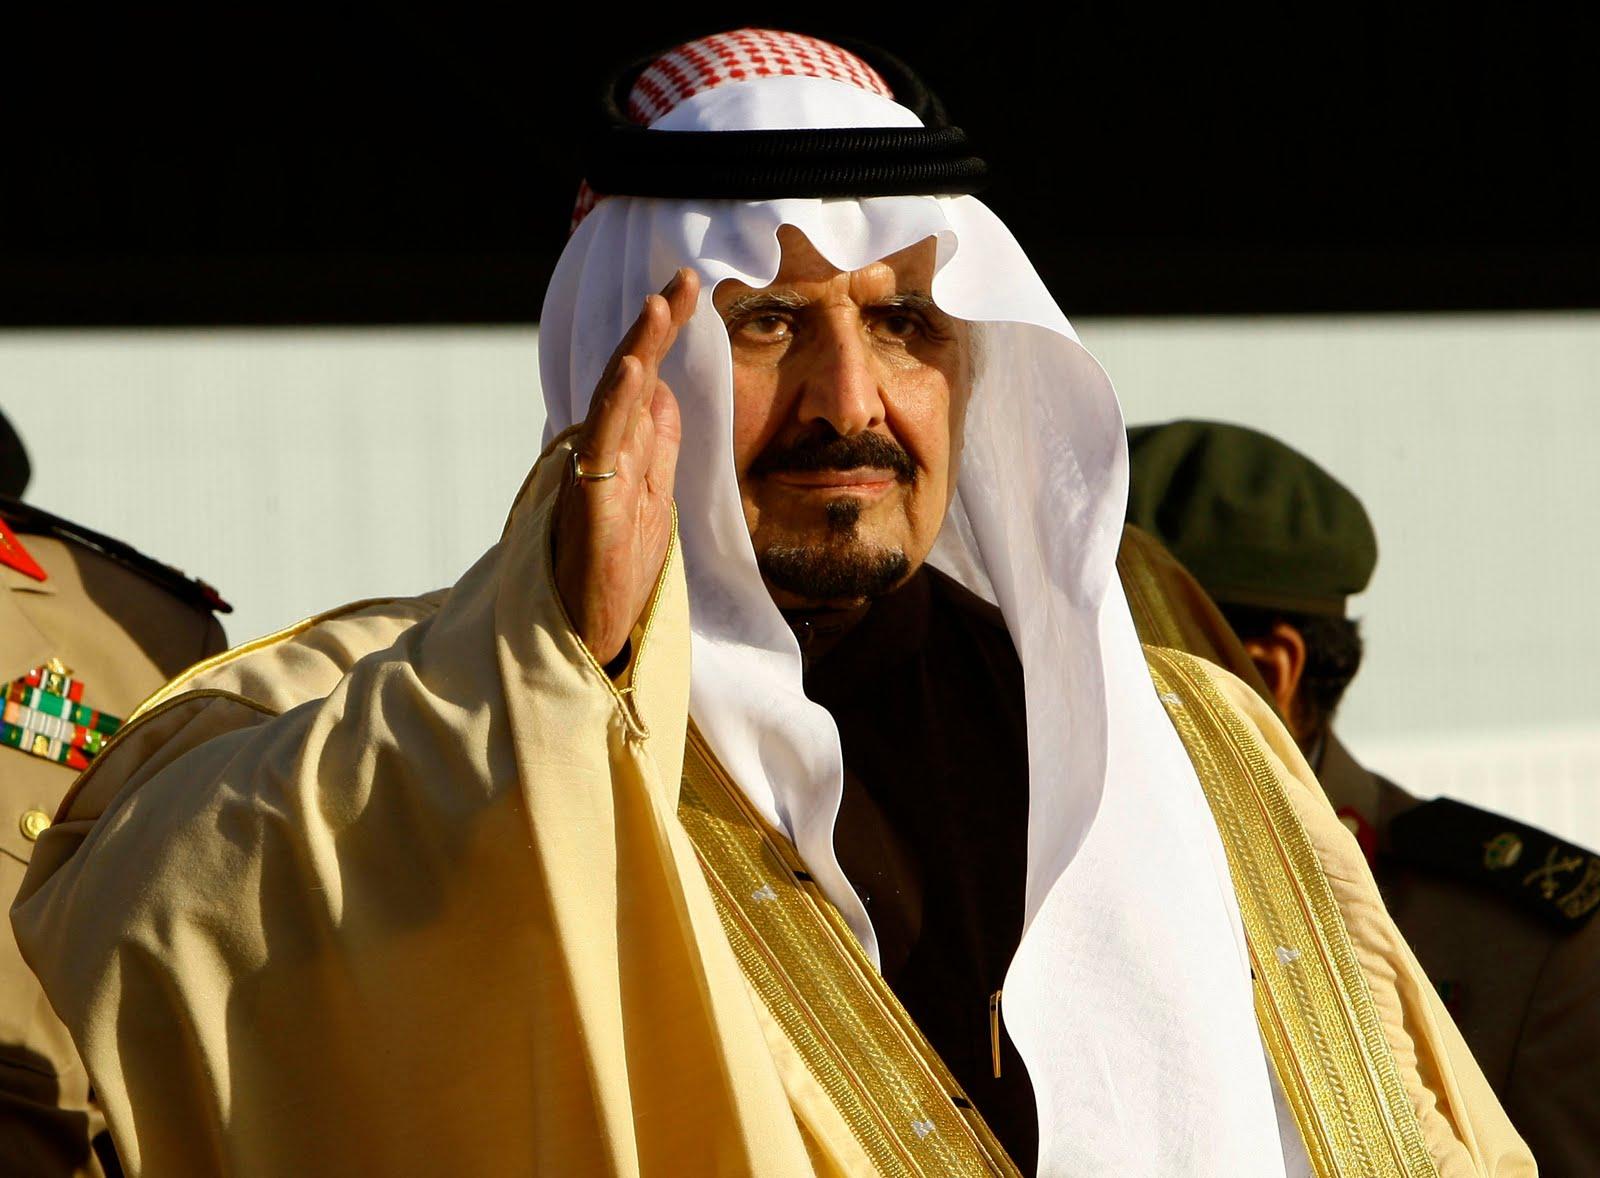 Prince Sultan